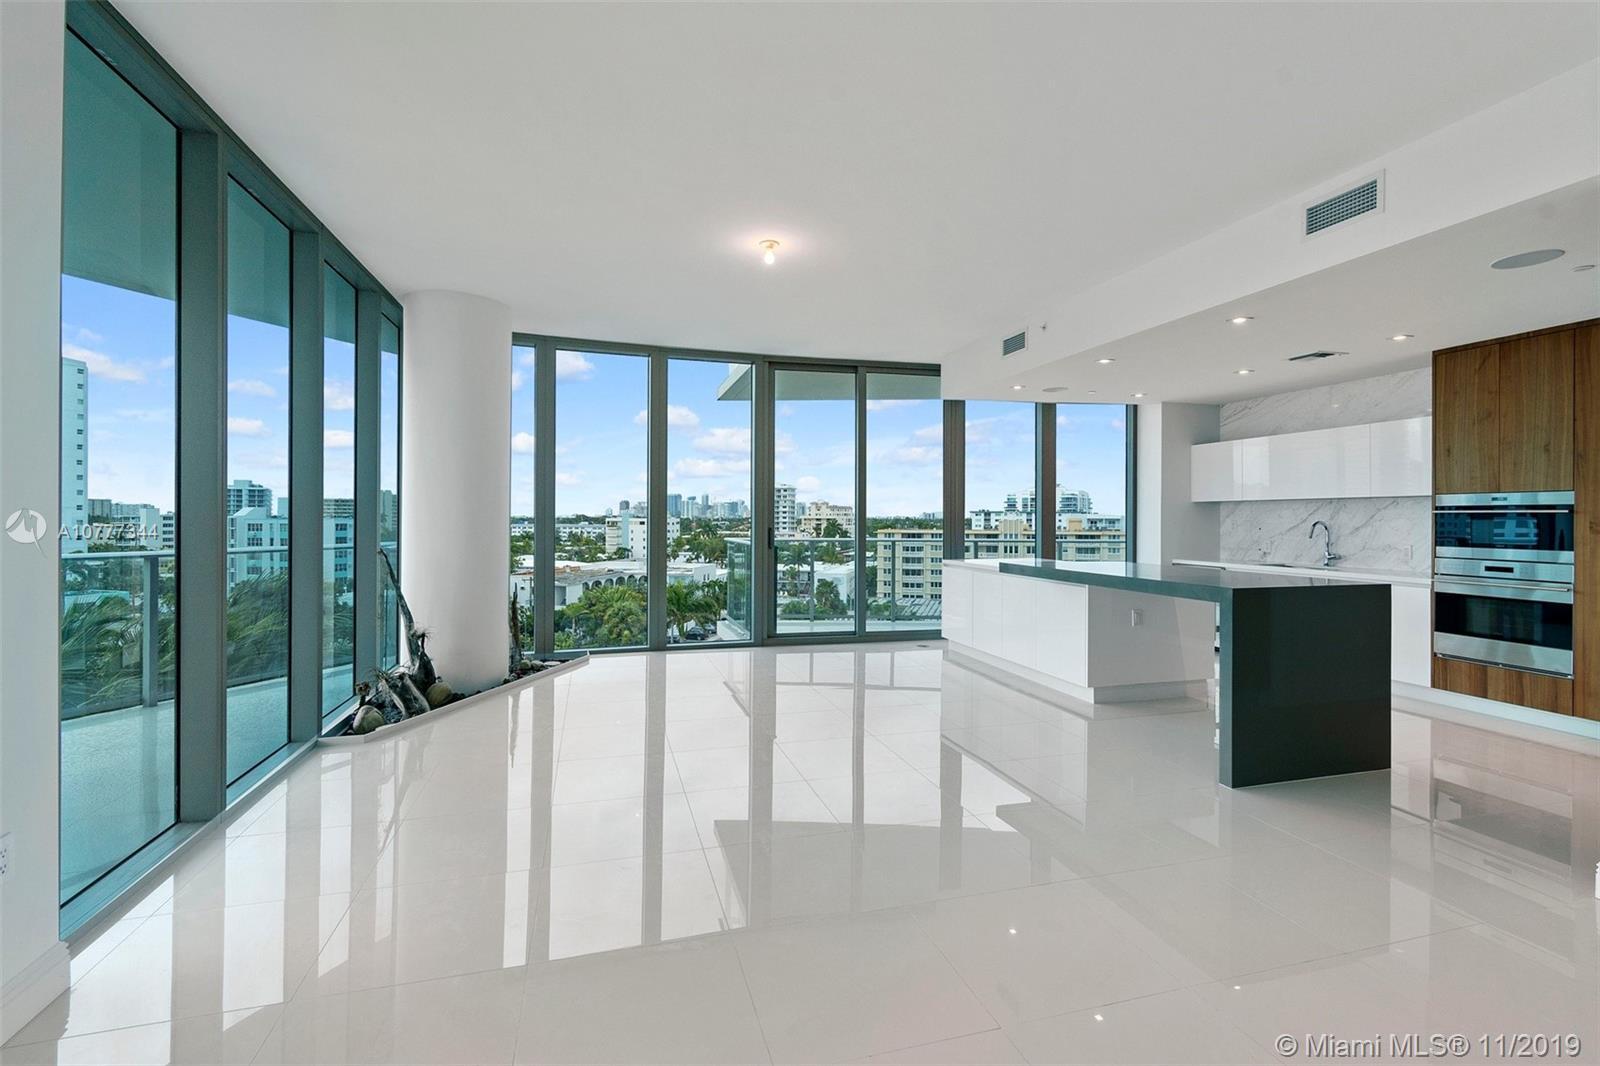 701 N Fort Lauderdale Beach Blvd 505, Fort Lauderdale, FL 33304